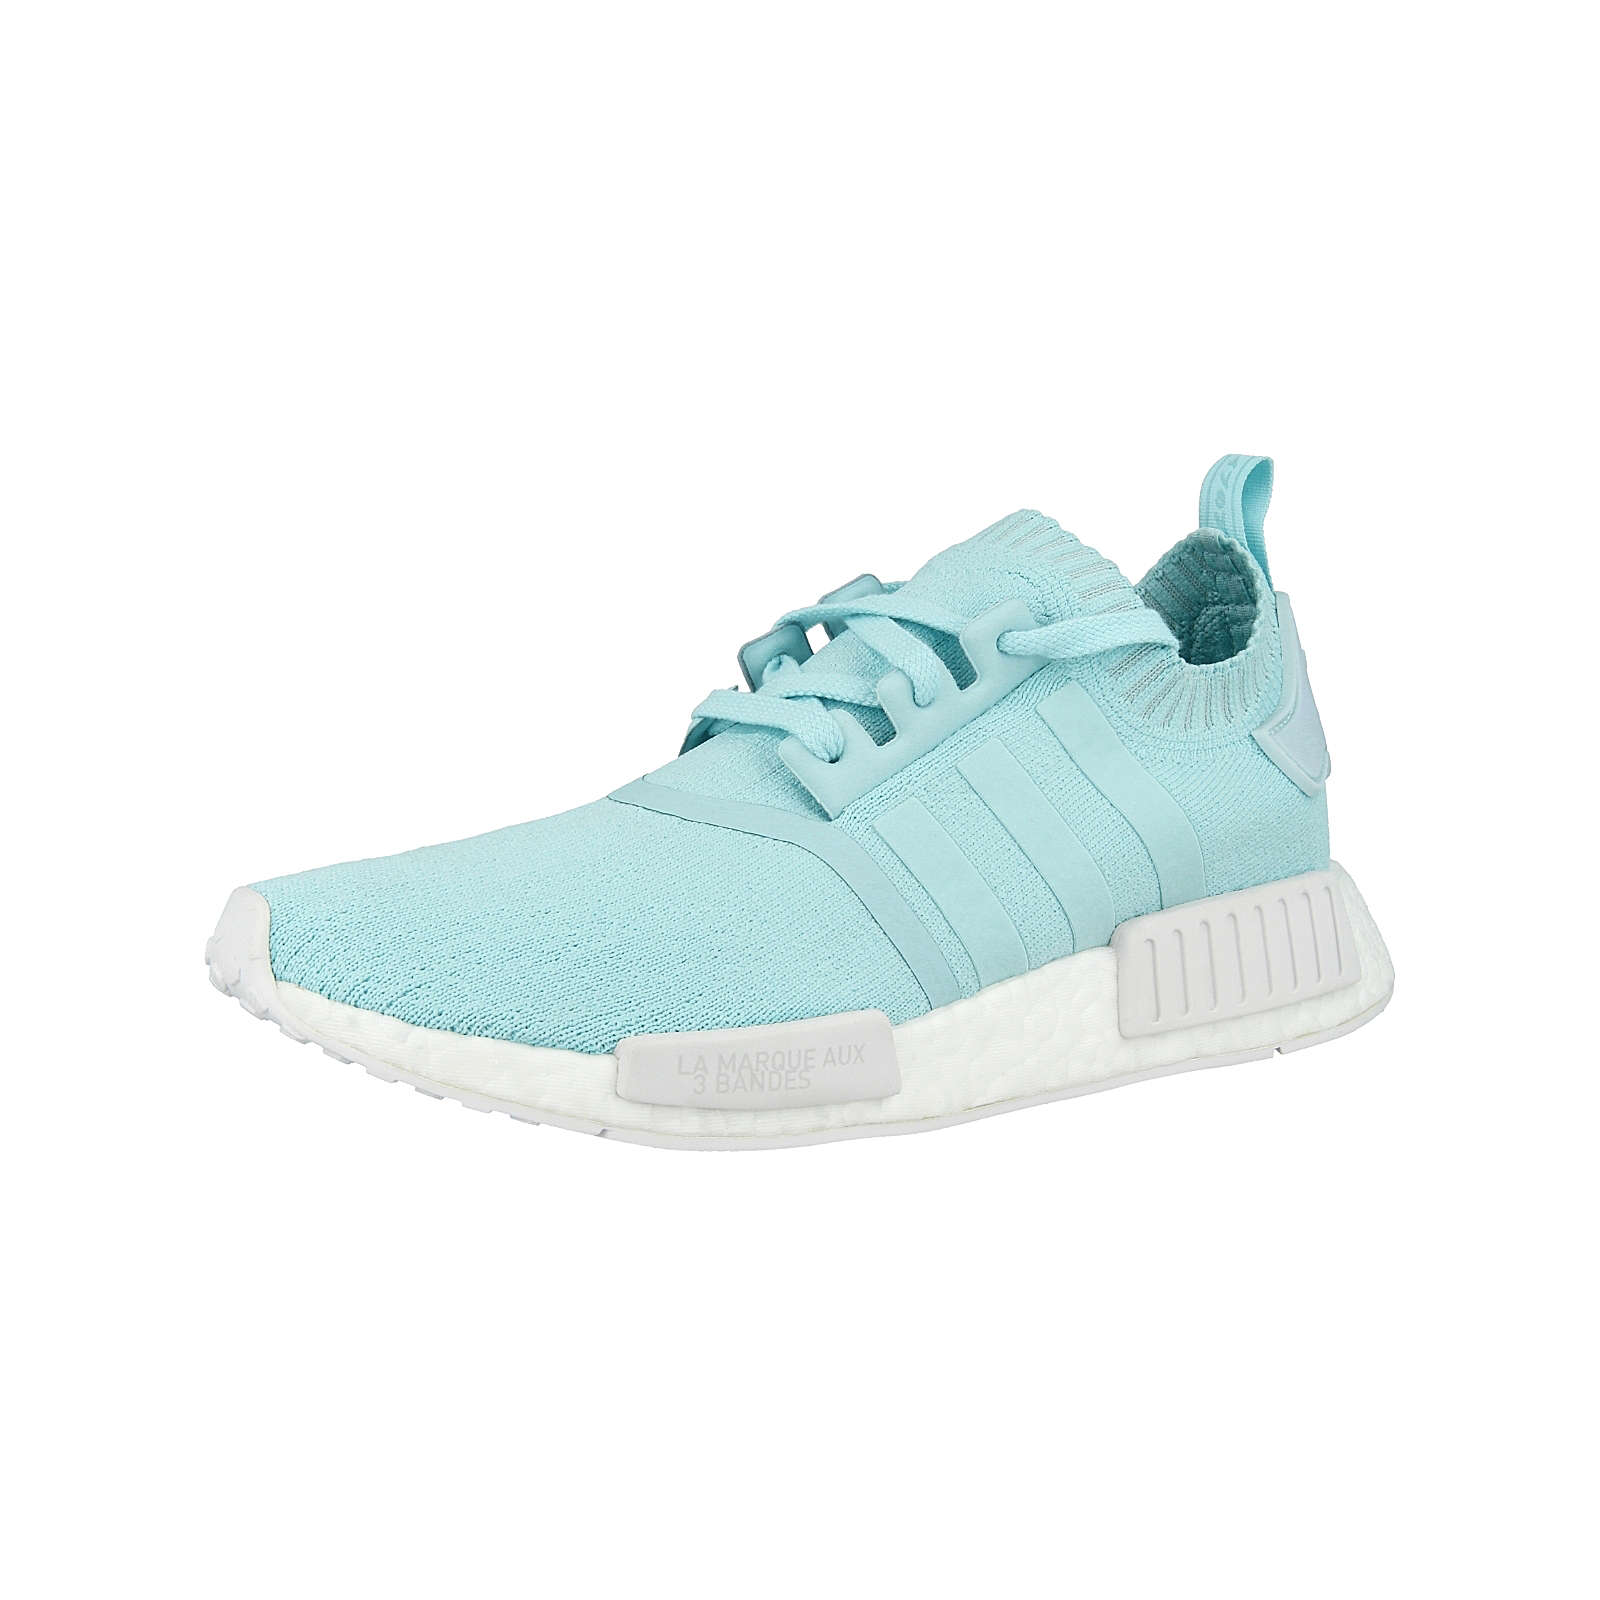 adidas Originals Schuhe NMD_R1 Primeknit Sneakers Low blau Damen Gr. 38 2/3